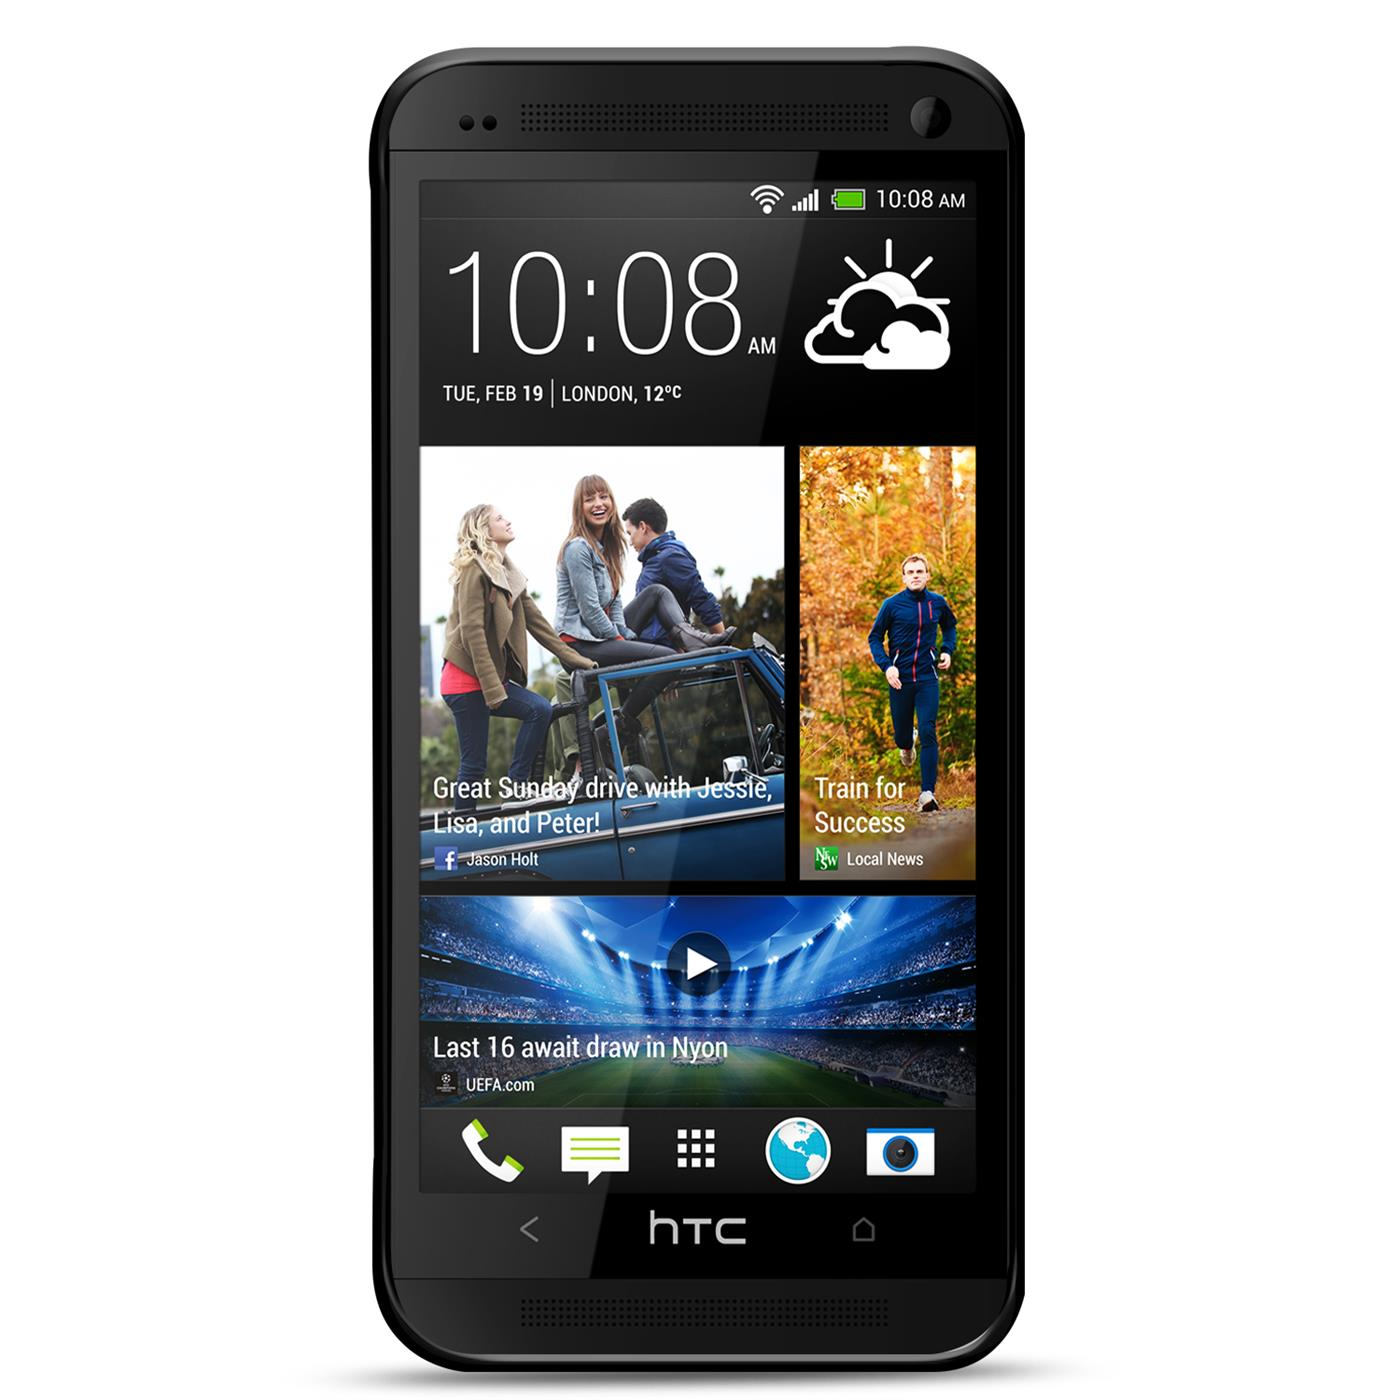 HTC-One-m9-Silikon-Gel-S-Line-Case-Cover-Ultra-Thin-Slim-Back-Bumper Indexbild 21